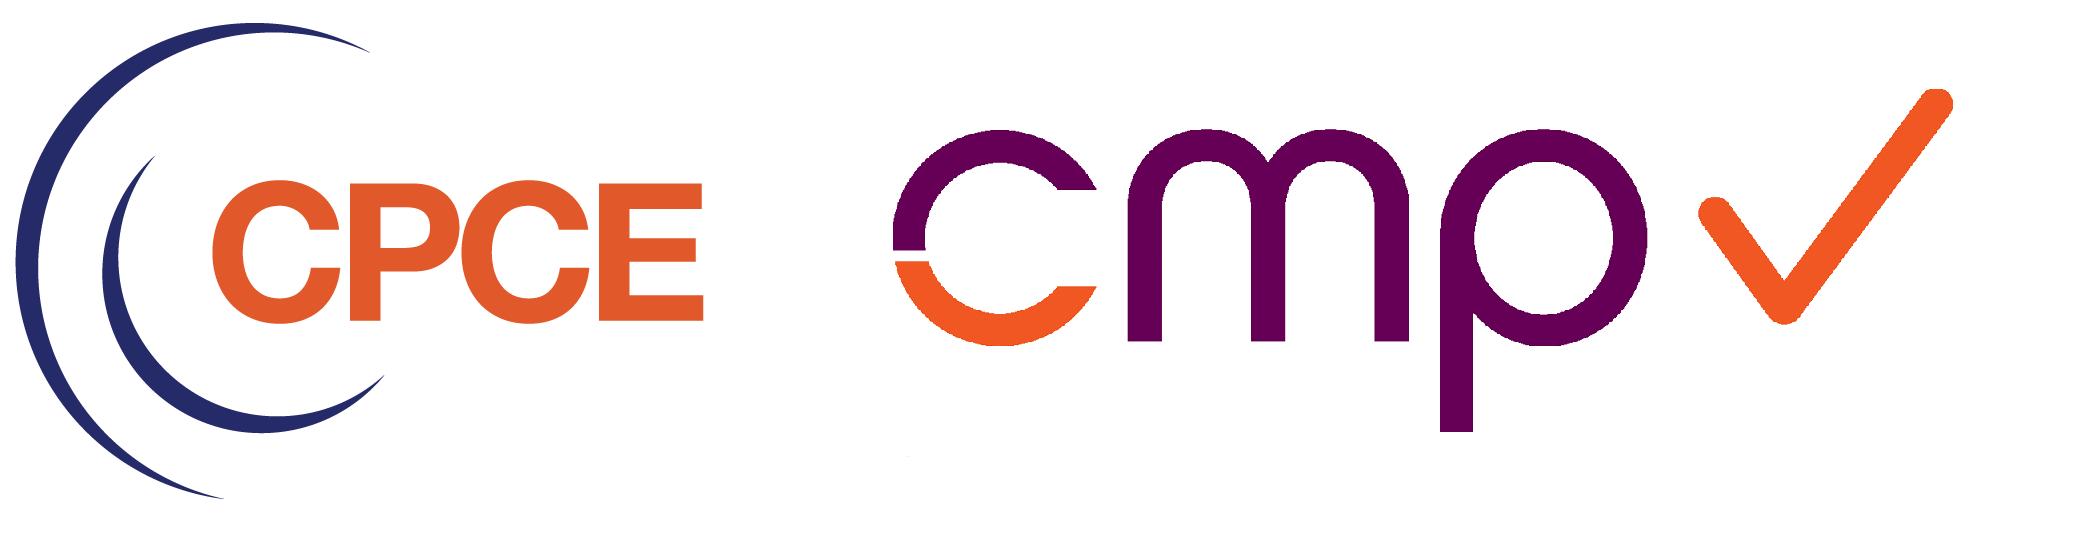 CPCE-CMP combined logo